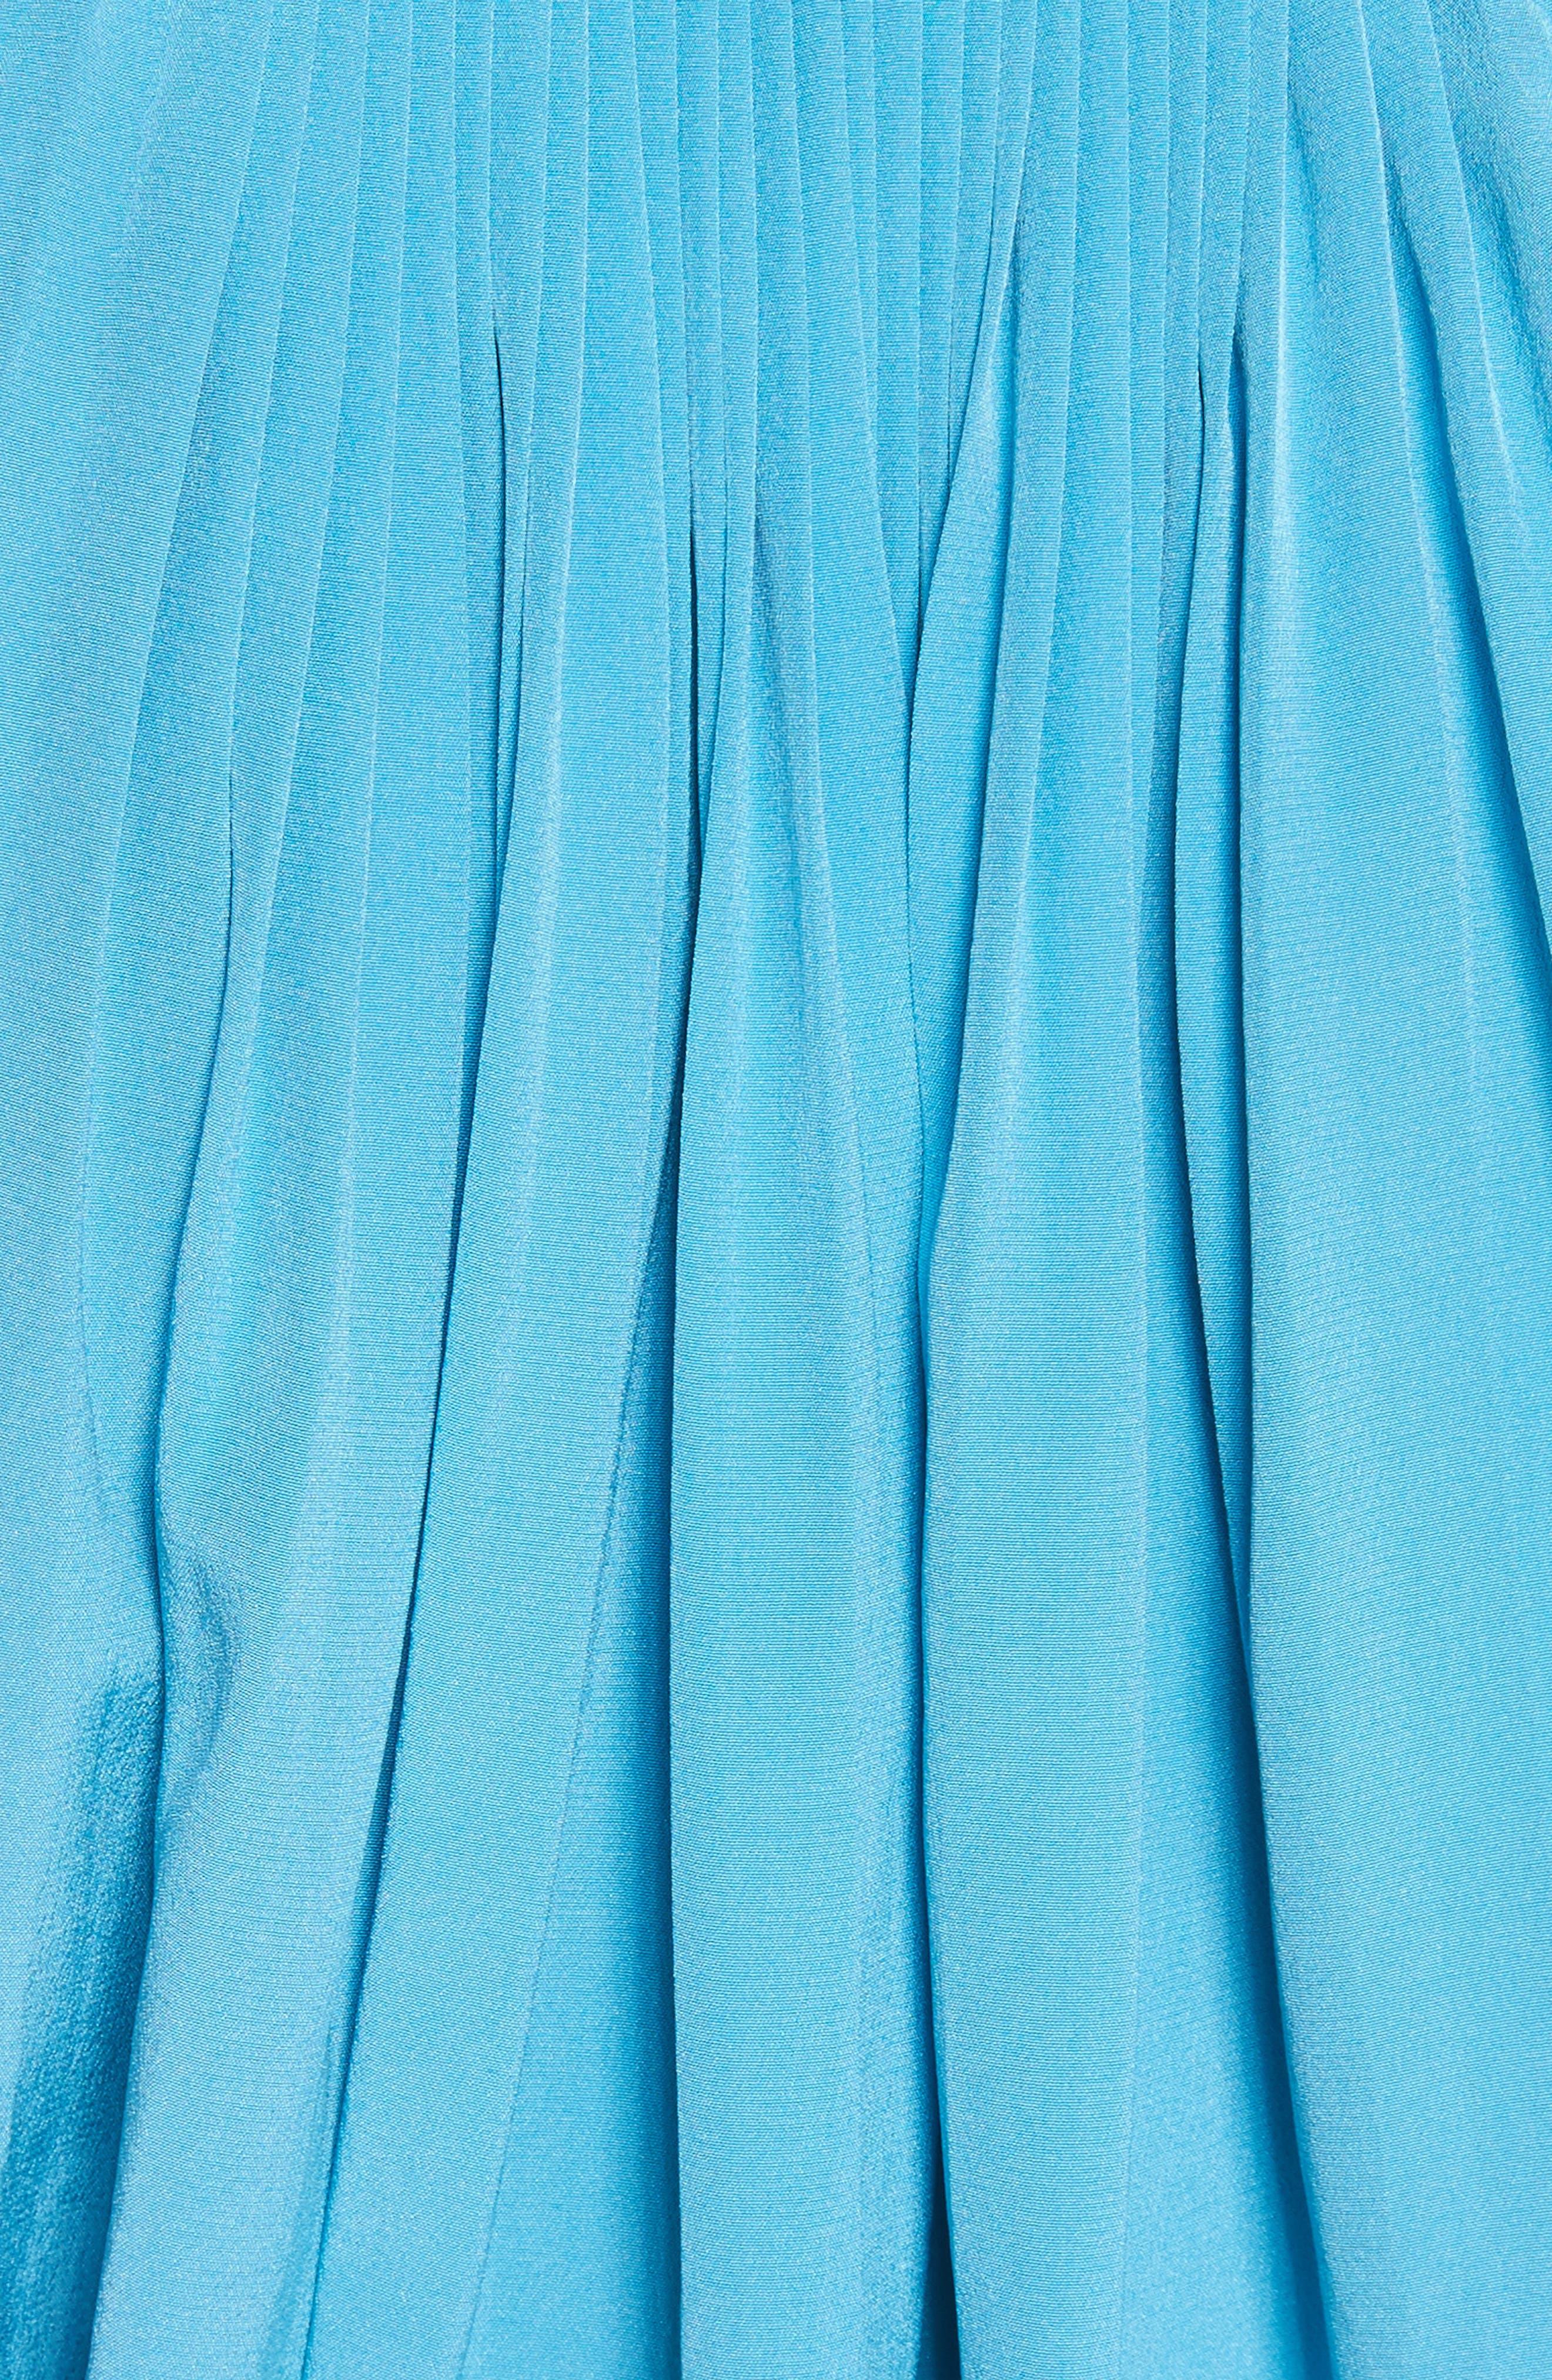 Arielle Sleeveless Silk Top,                             Alternate thumbnail 9, color,